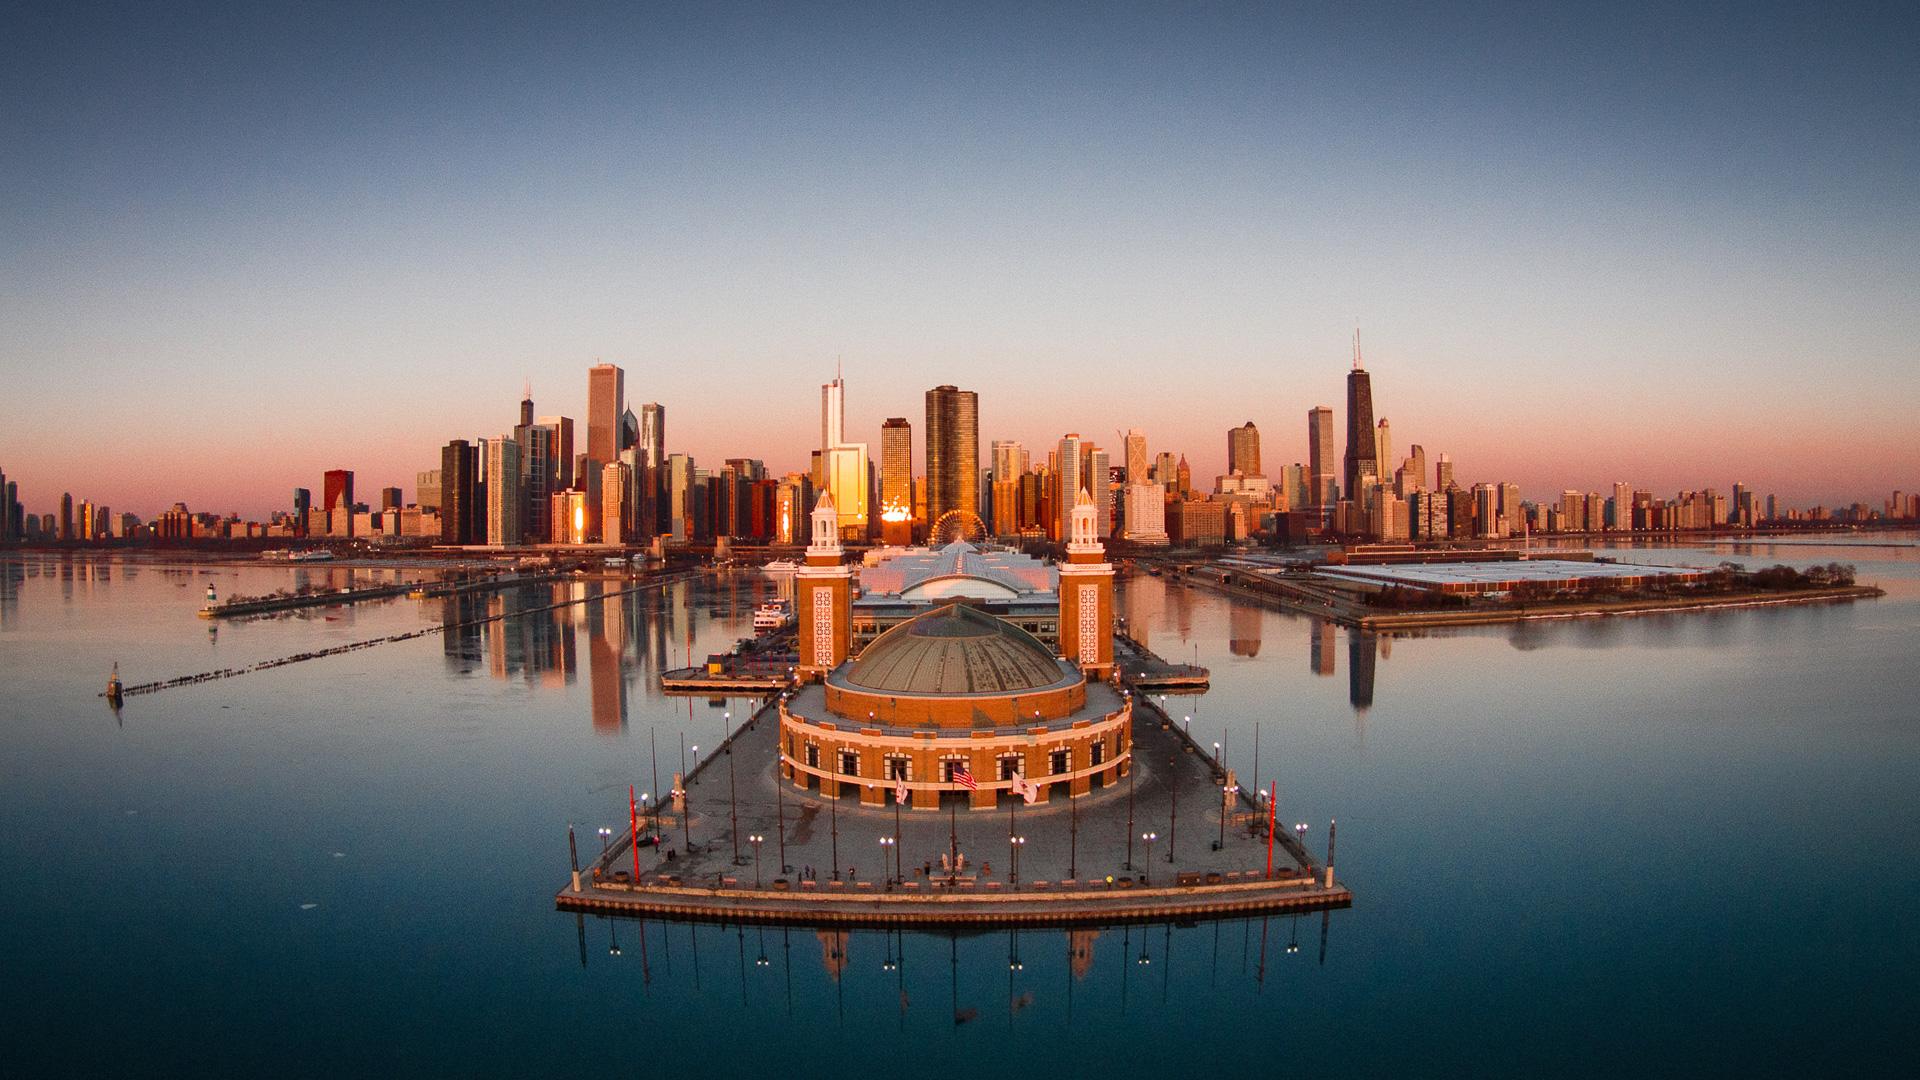 Navy PIer aerial of Chicago Illinois